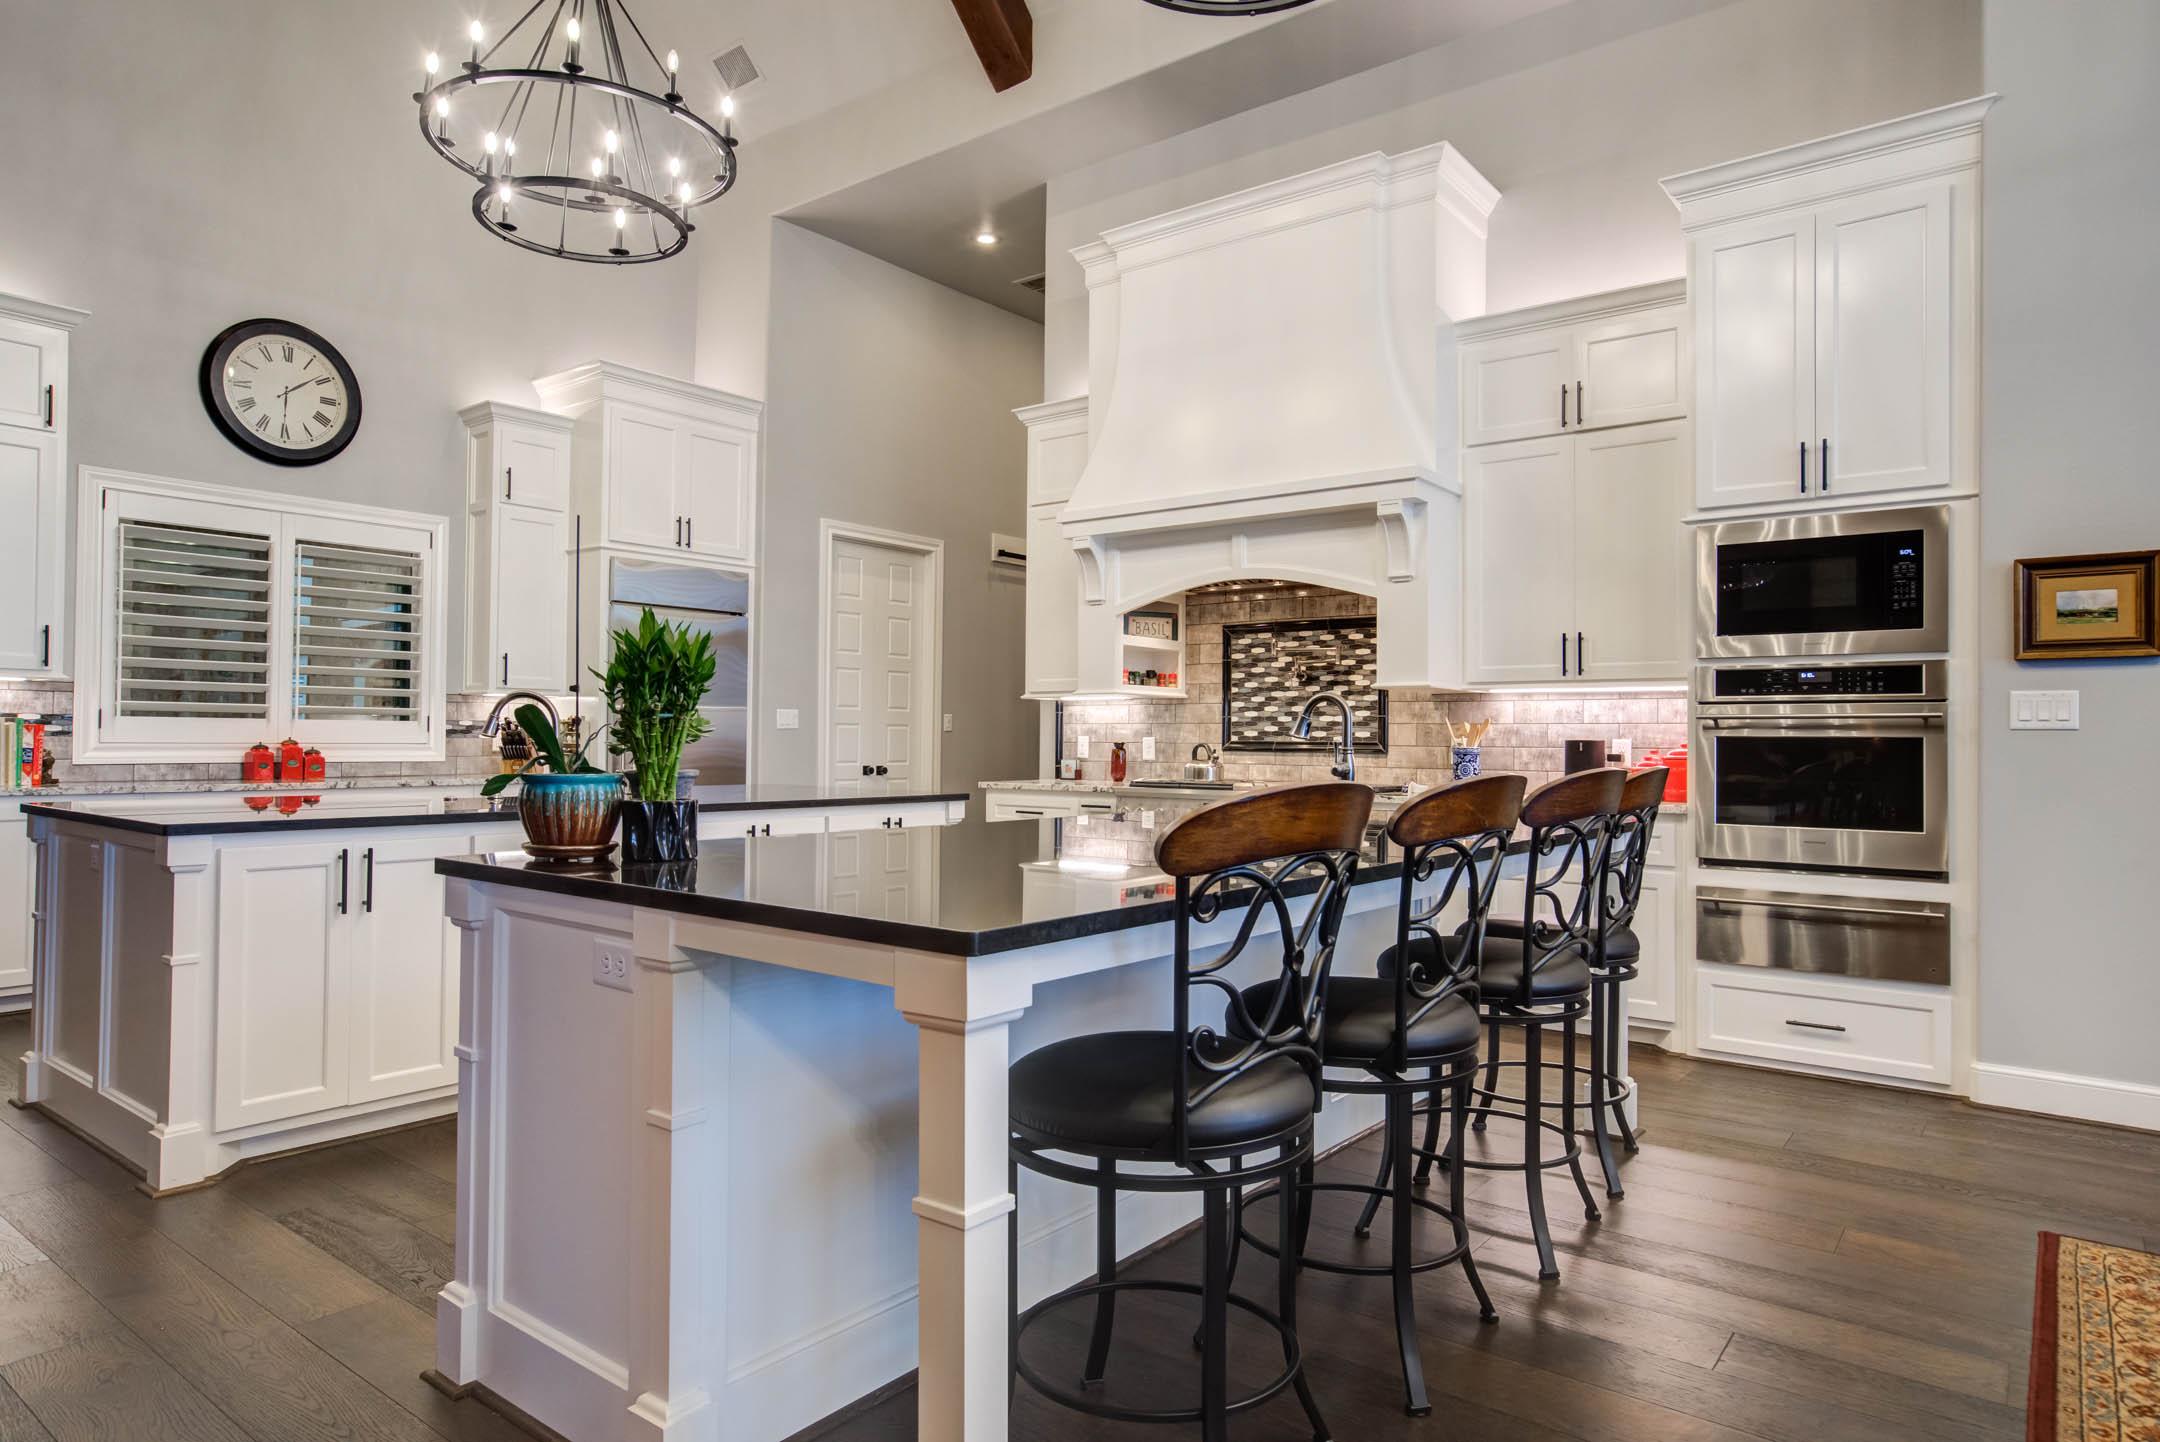 Beautiful, modern kitchen in custom home in Lubbock, Texas.